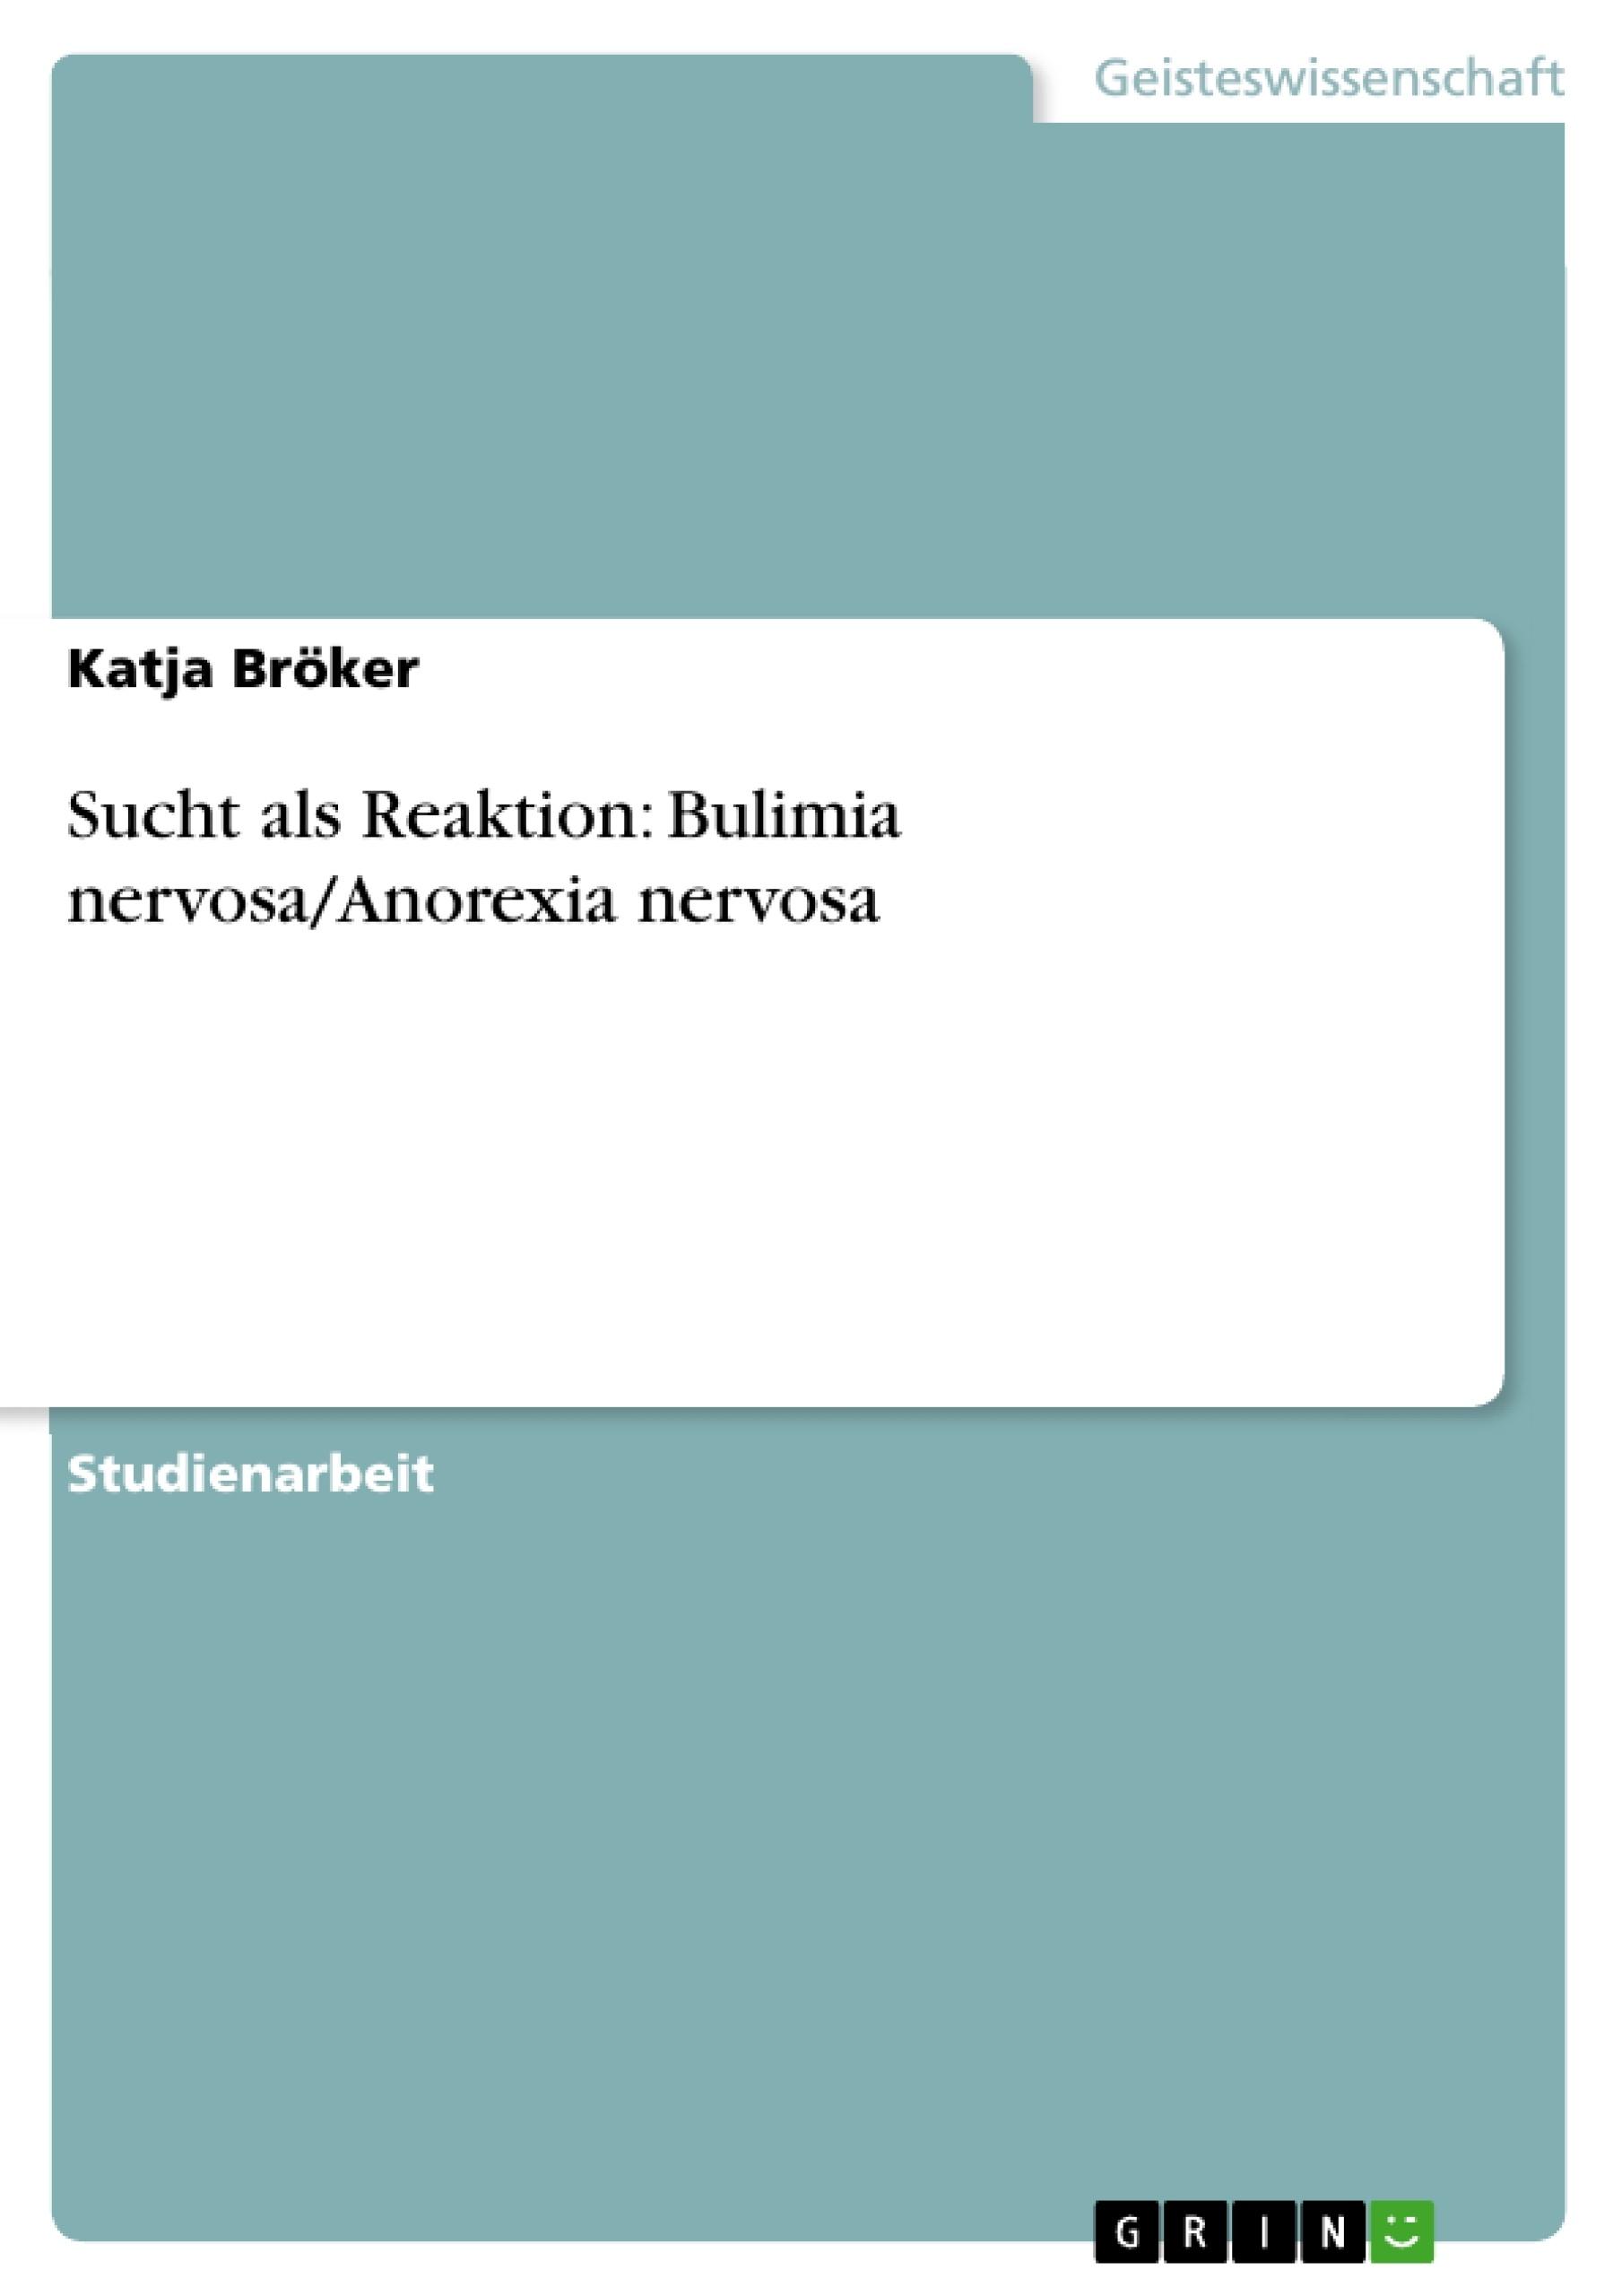 Titel: Sucht als Reaktion: Bulimia nervosa/Anorexia nervosa